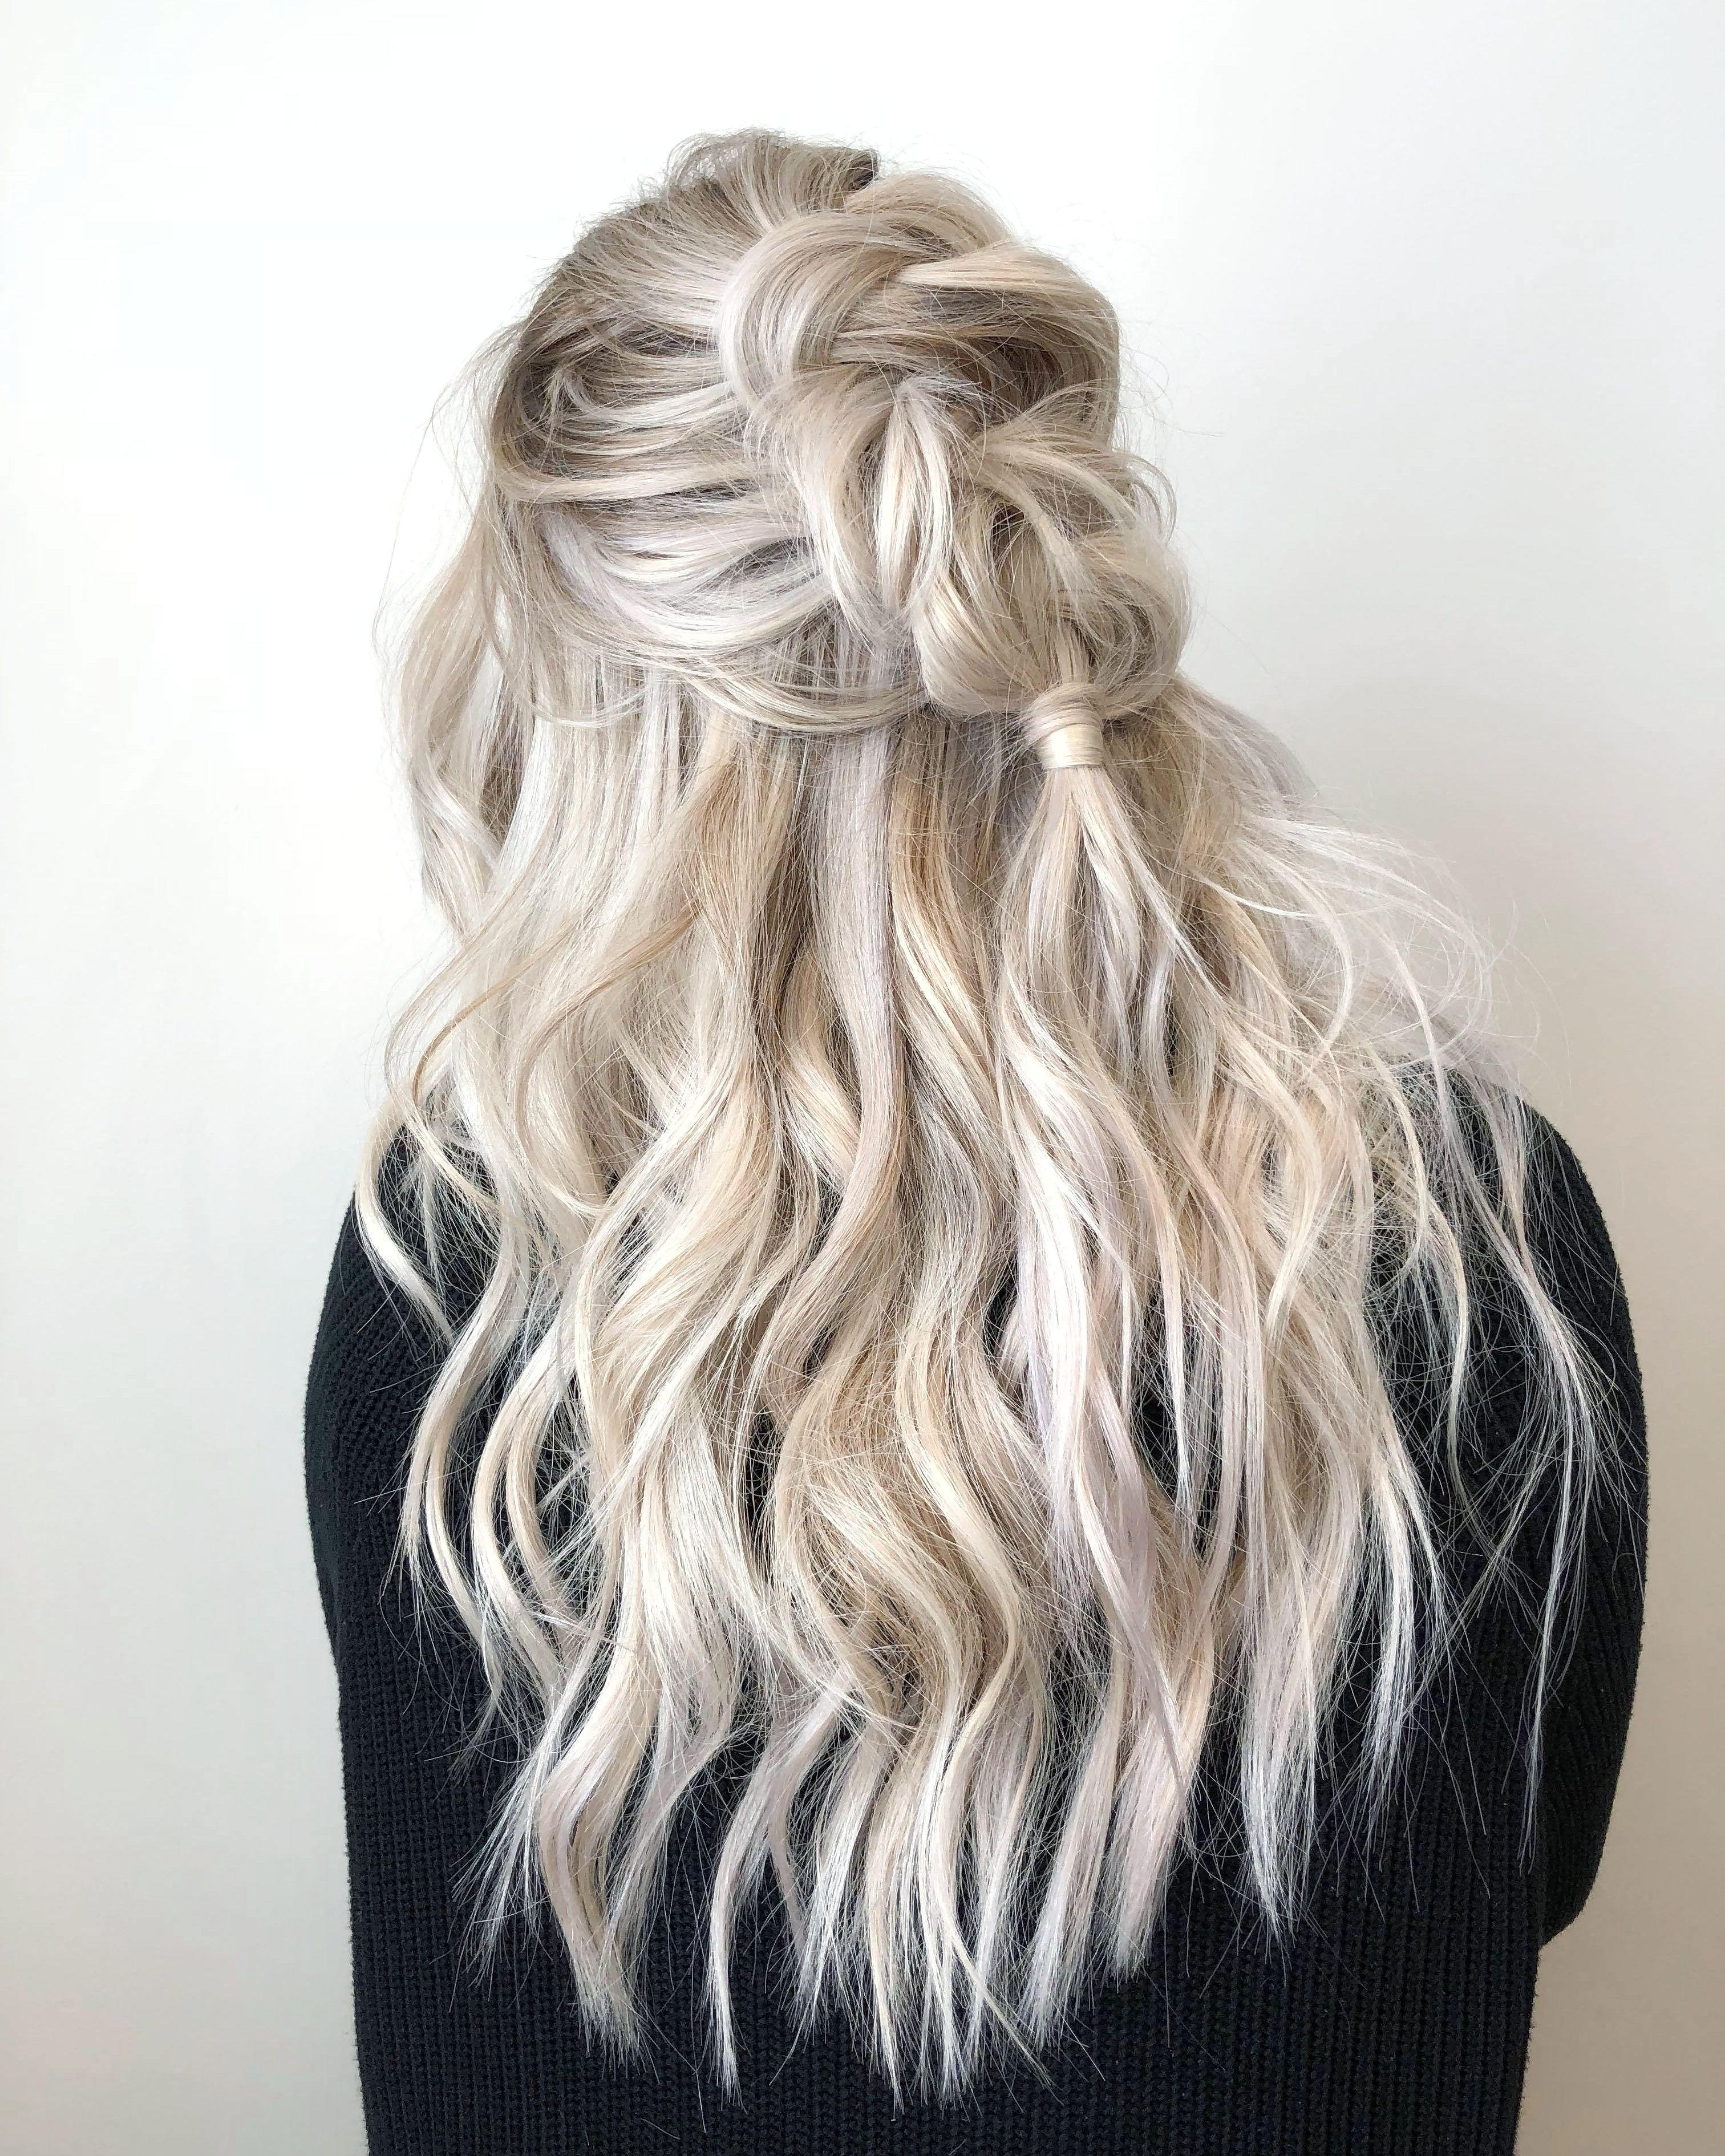 Fun braided hairstyle on beautiful long blonde hair hairstylesudud